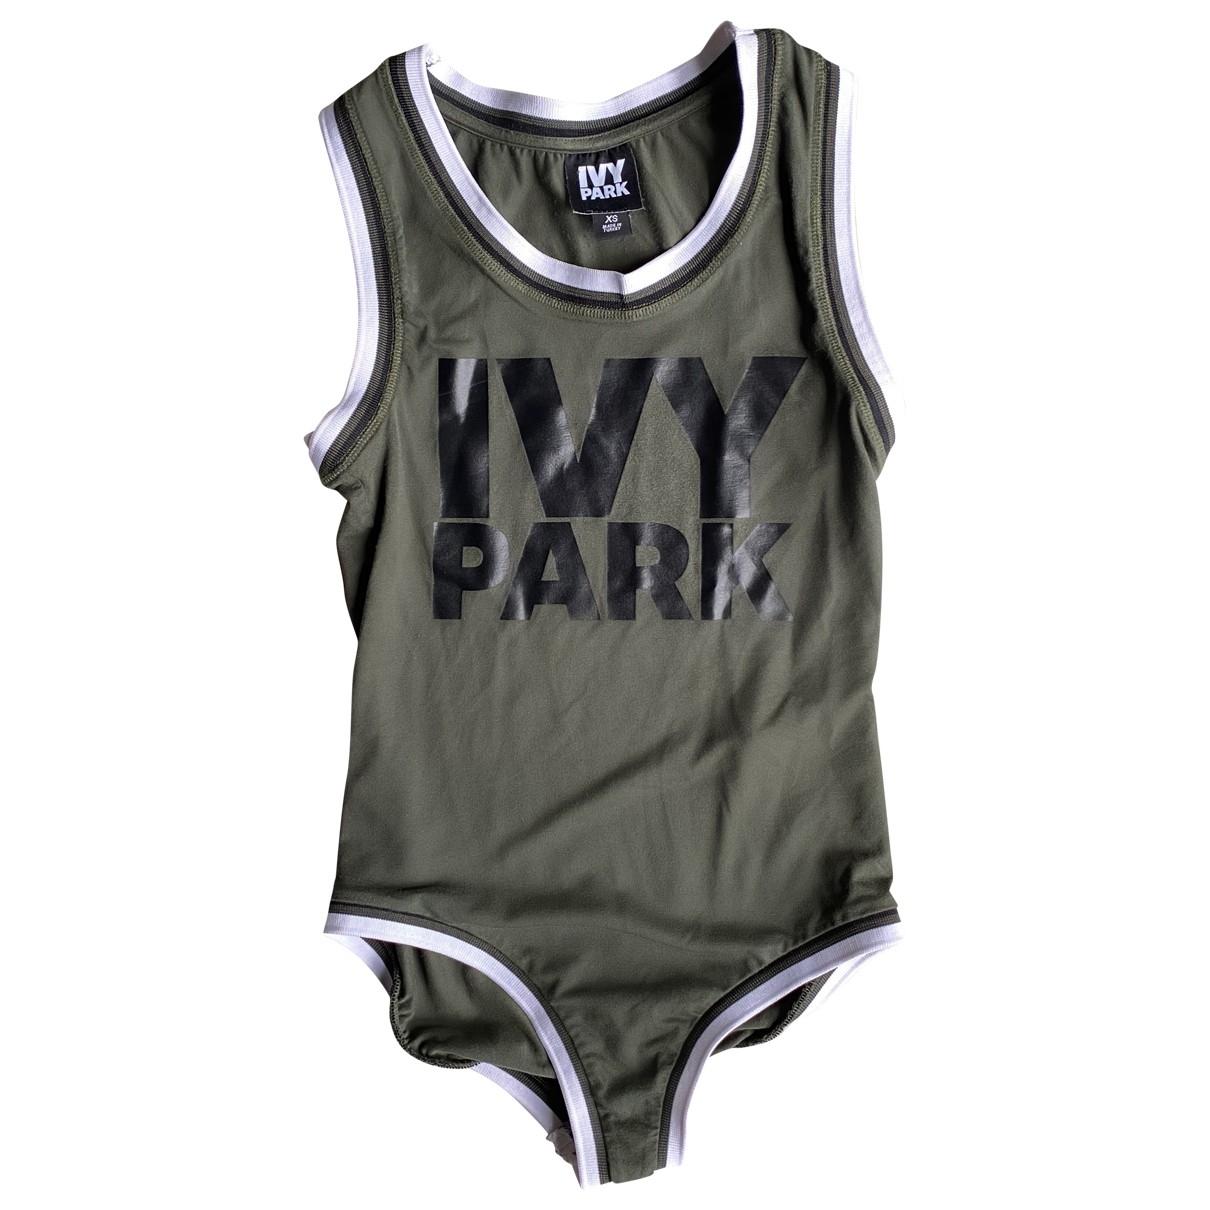 Ivy Park \N Khaki  top for Women XS International